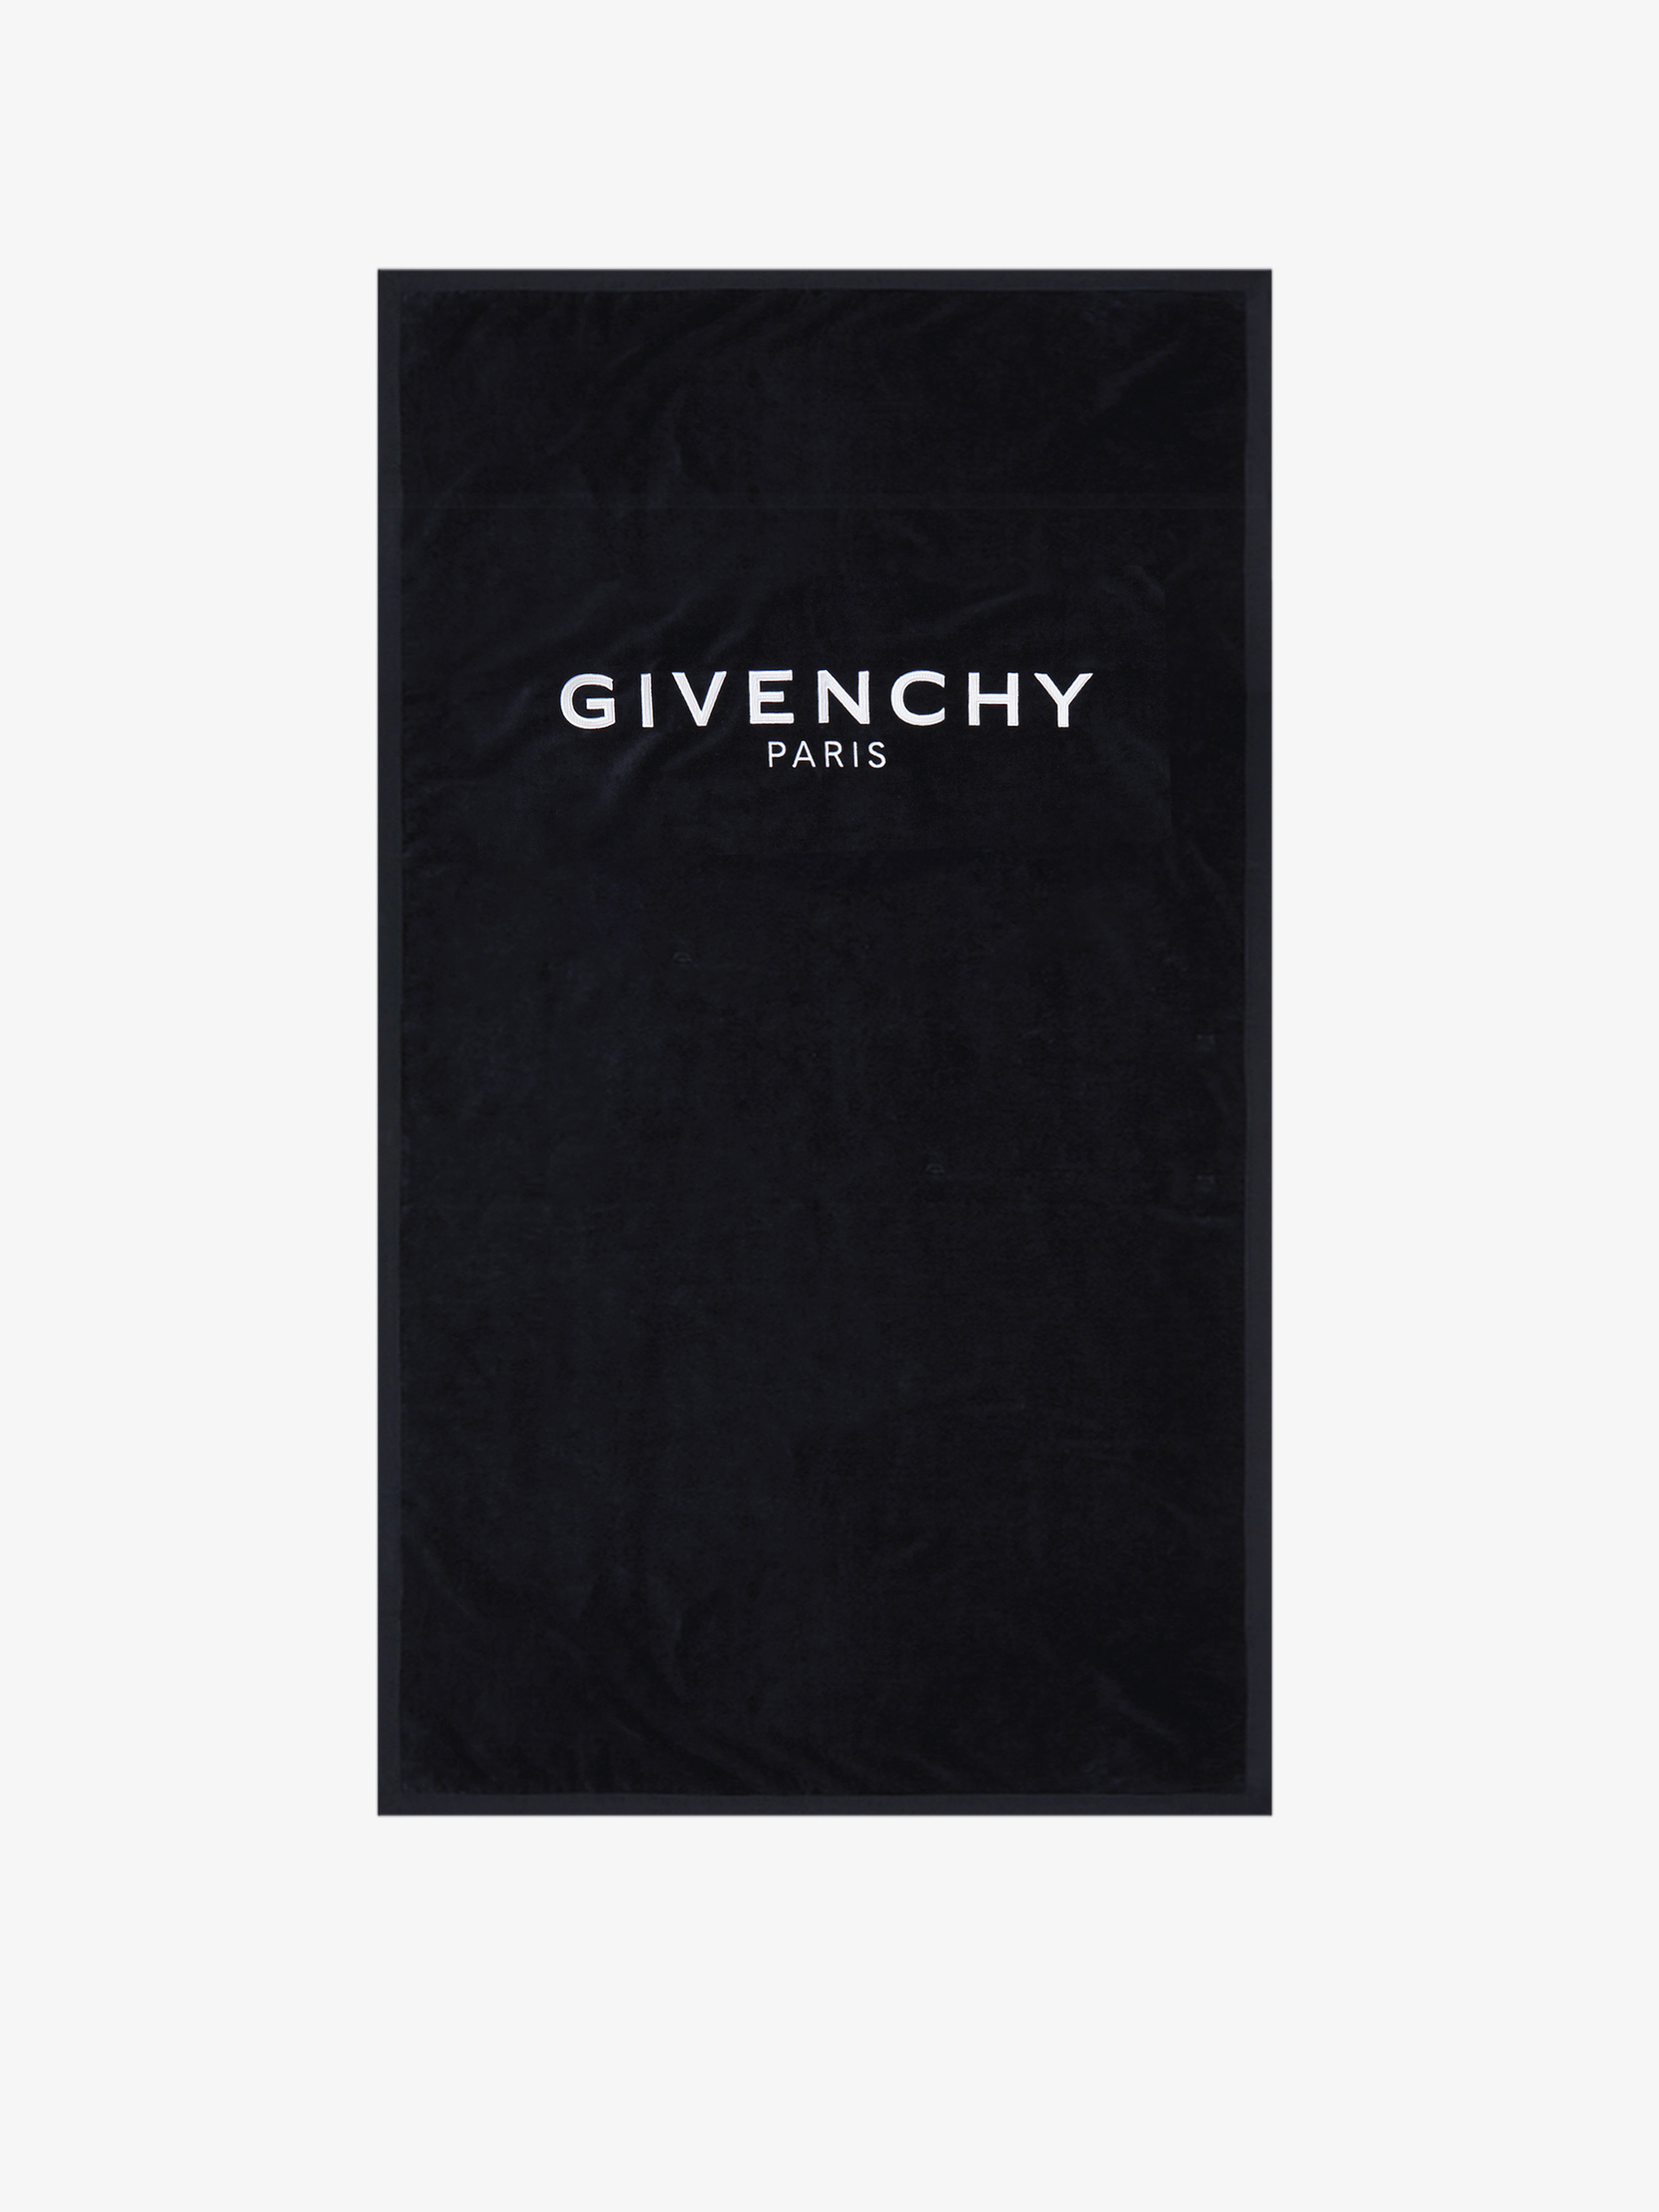 GIVENCHY PARIS beach towel